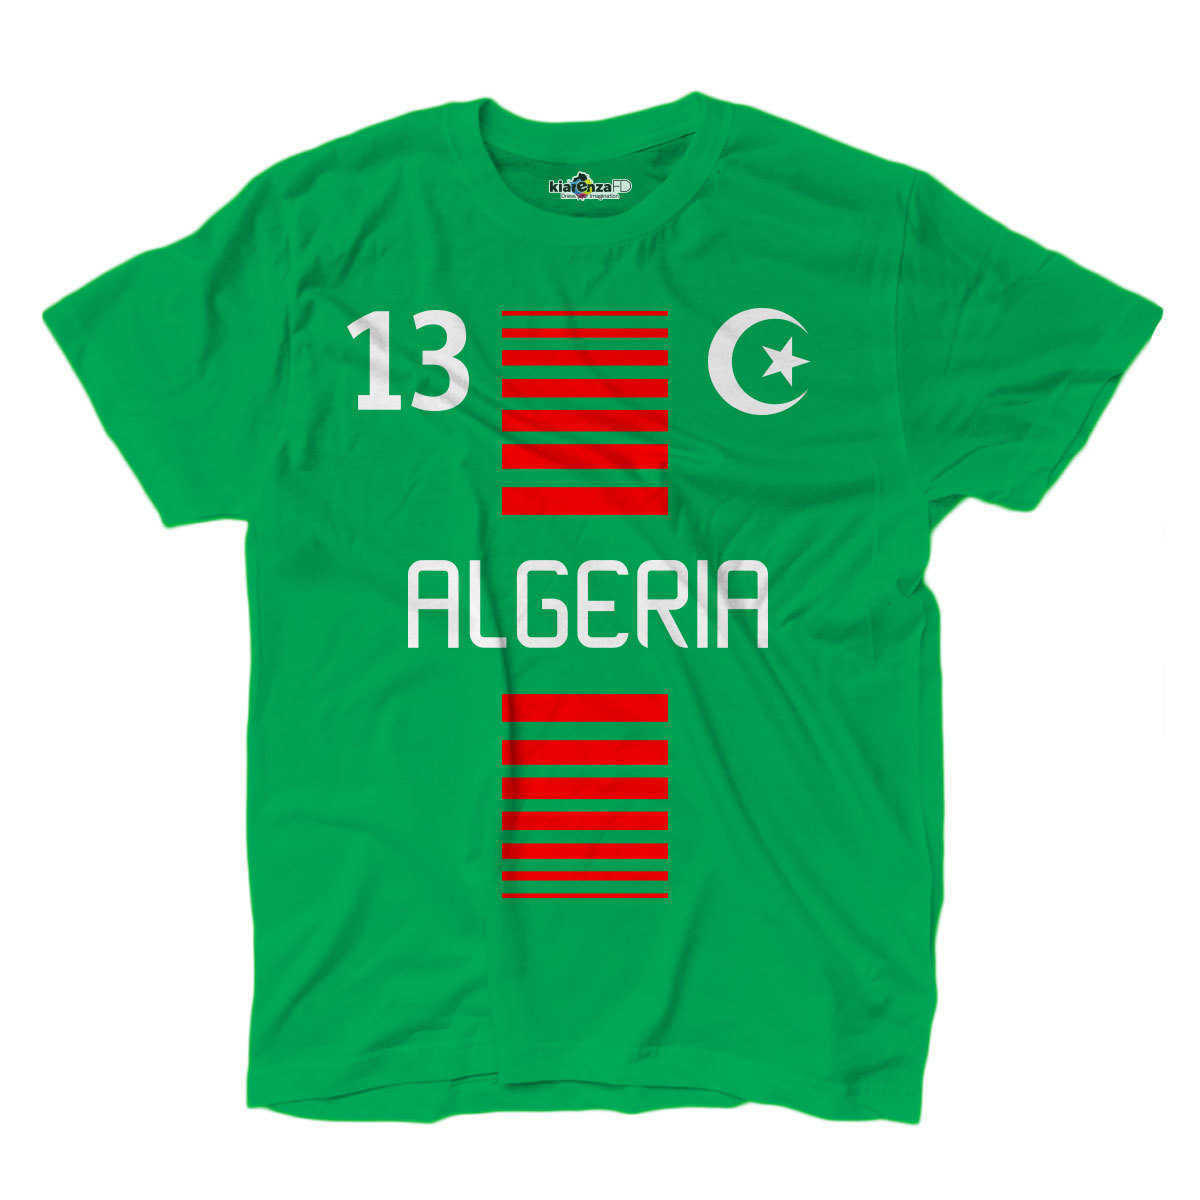 Camiseta deportiva nacional hombre Argelia 13 Deportes Fútbol África Media luna 1 S